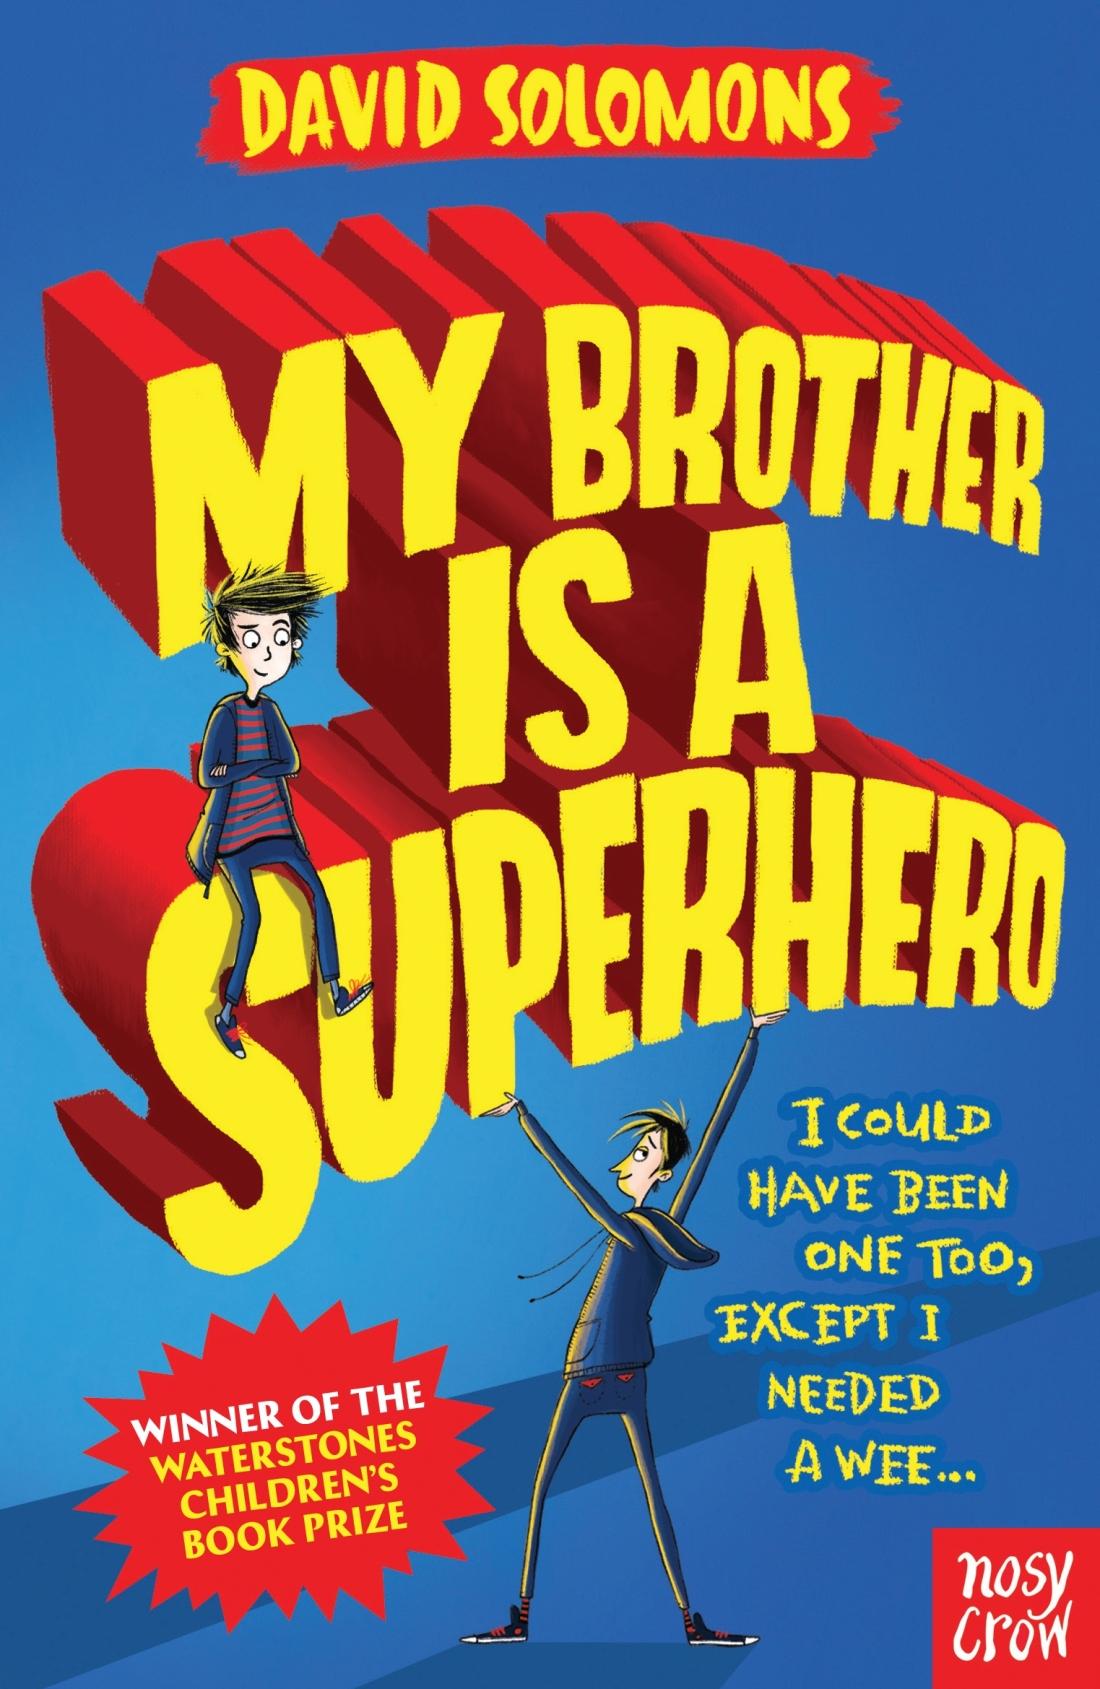 My-Brother-Is-a-Superhero-68851-3mmmjf.jpg